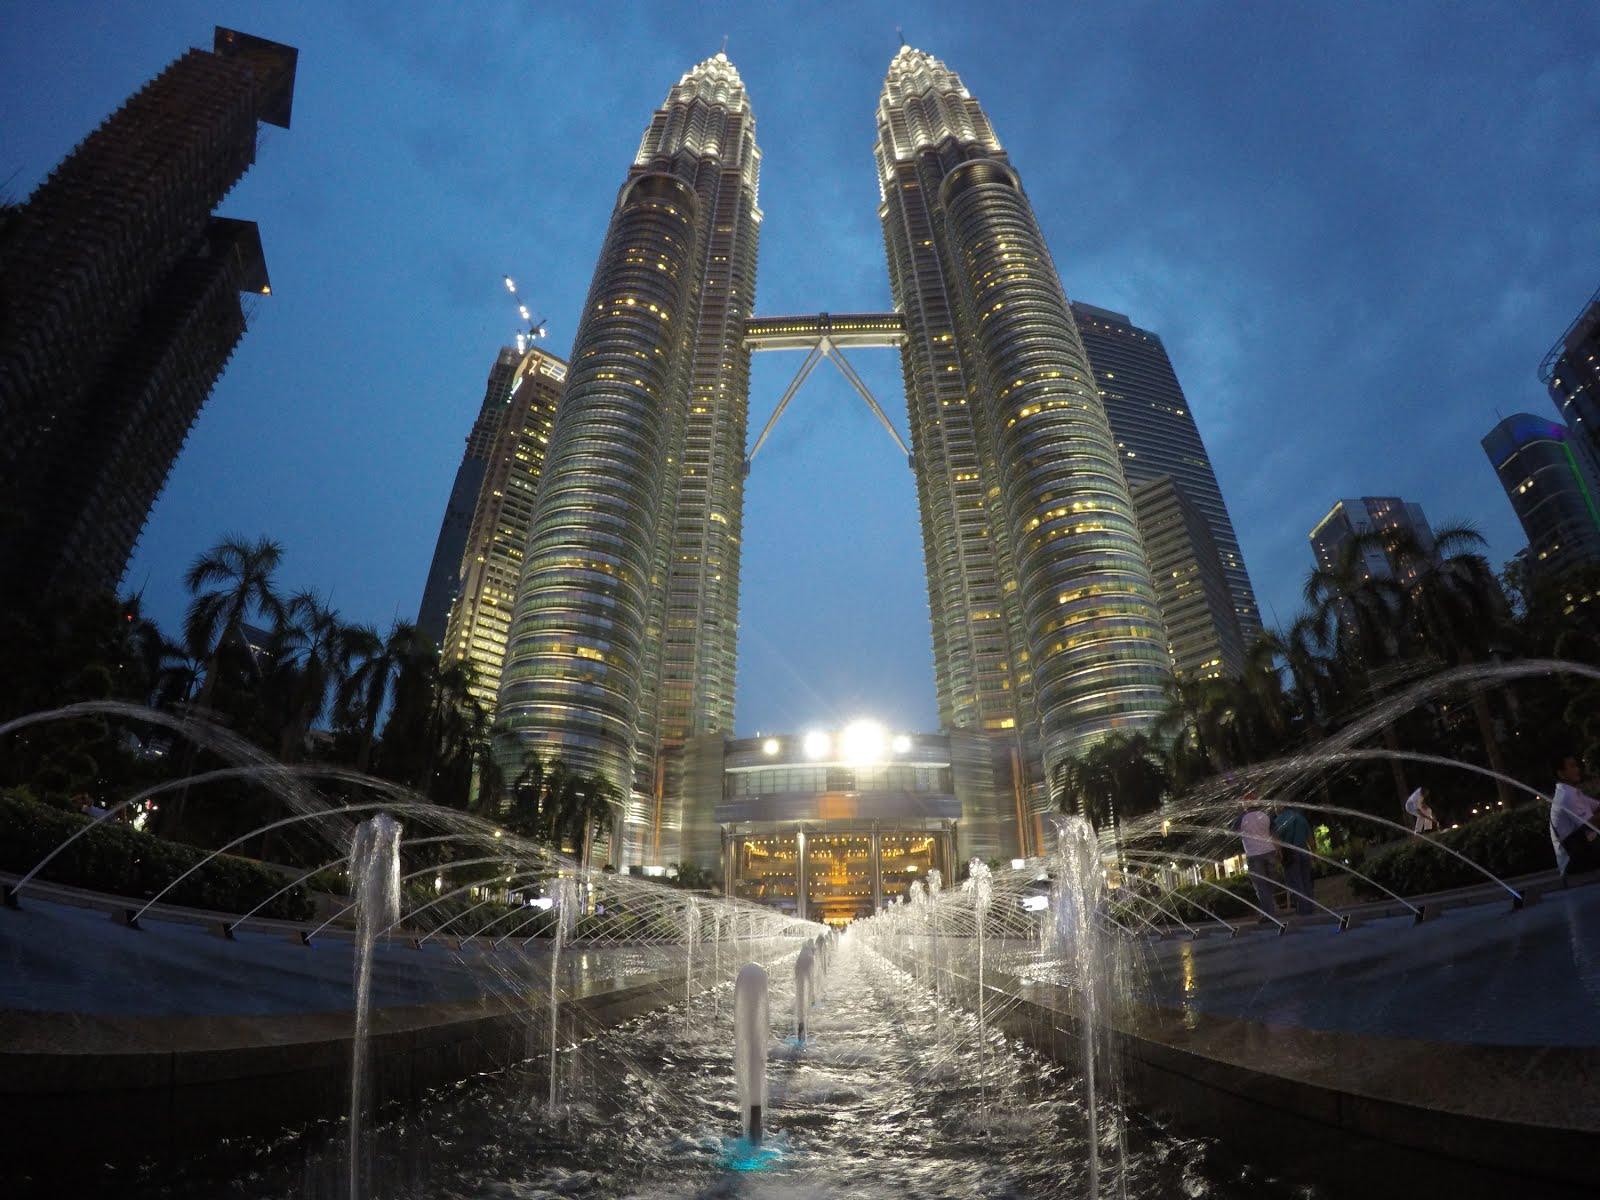 Kuala Lumpur: Roteiro de 1 dia e 1/2